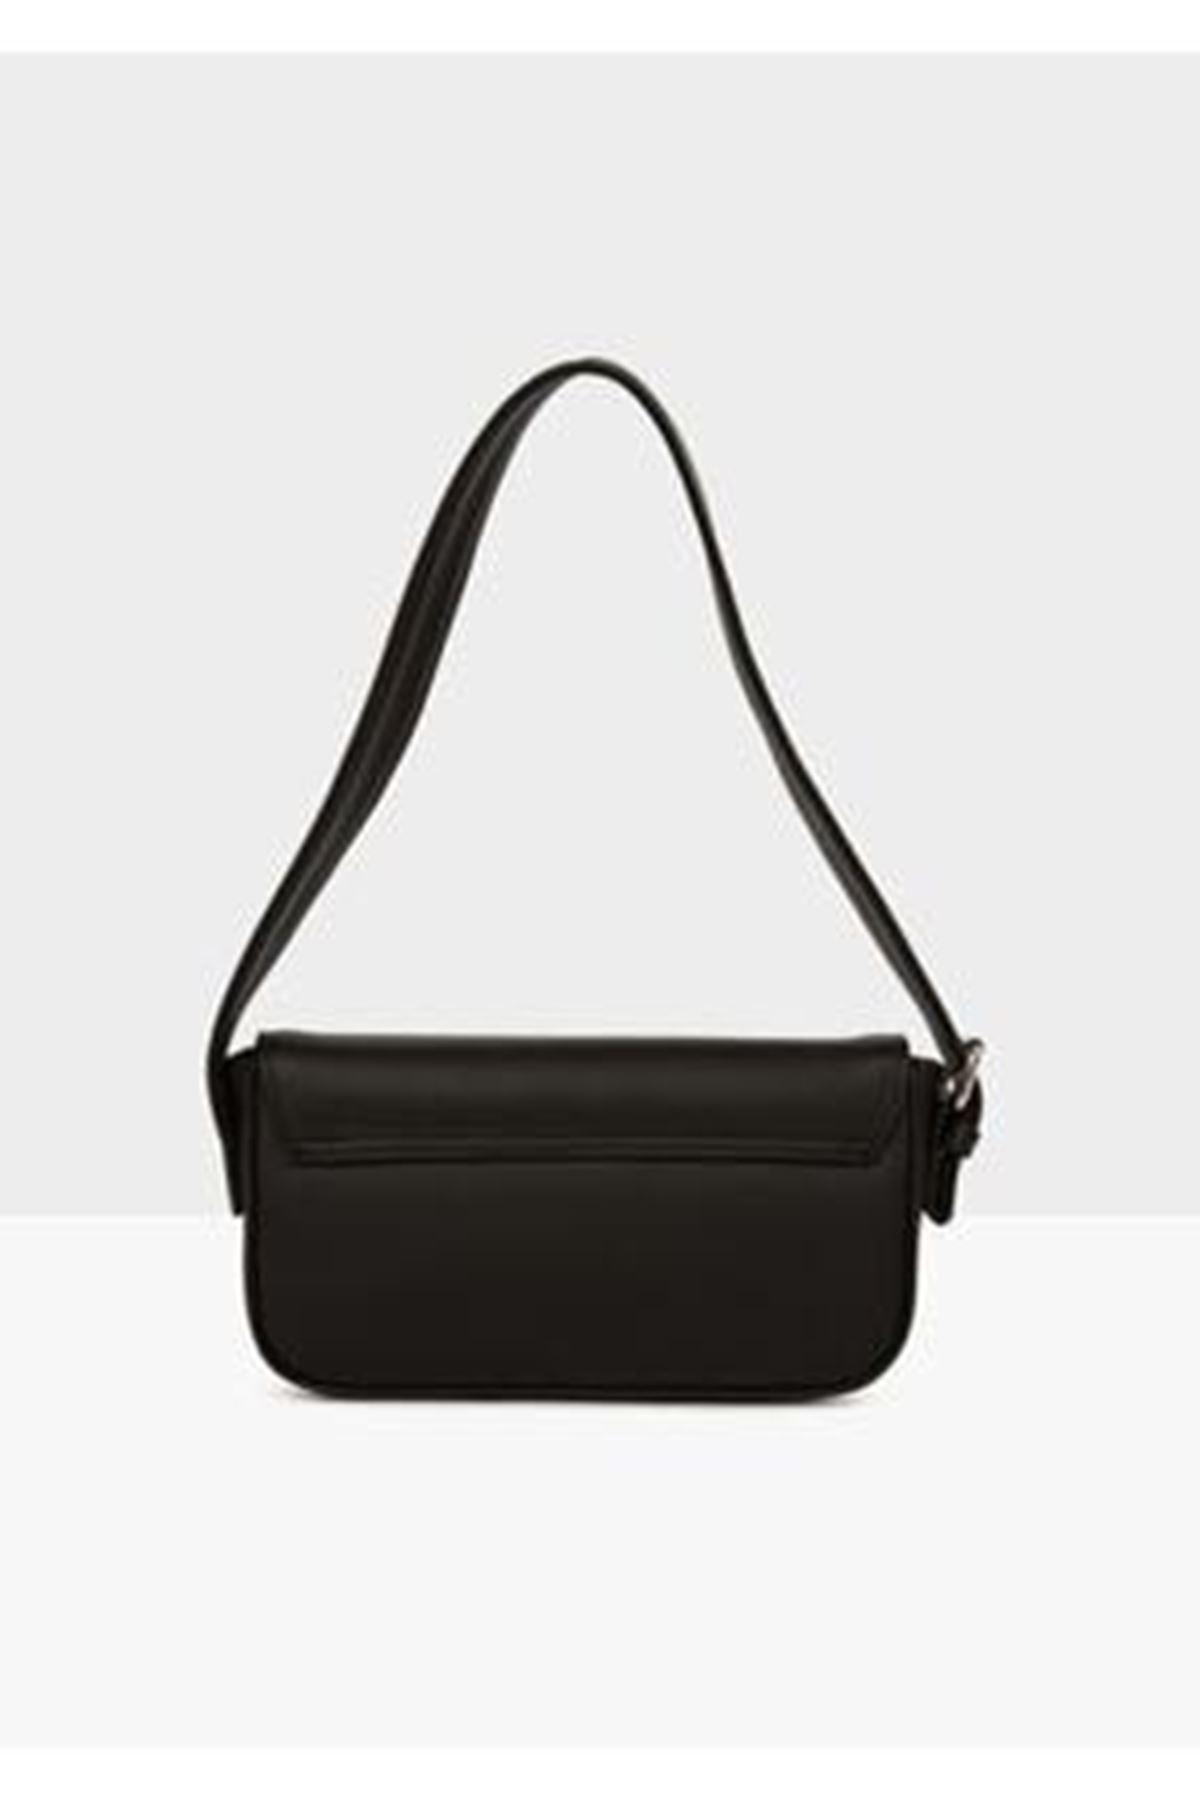 Tarta Siyah Cilt Kapaklı Baget Çanta